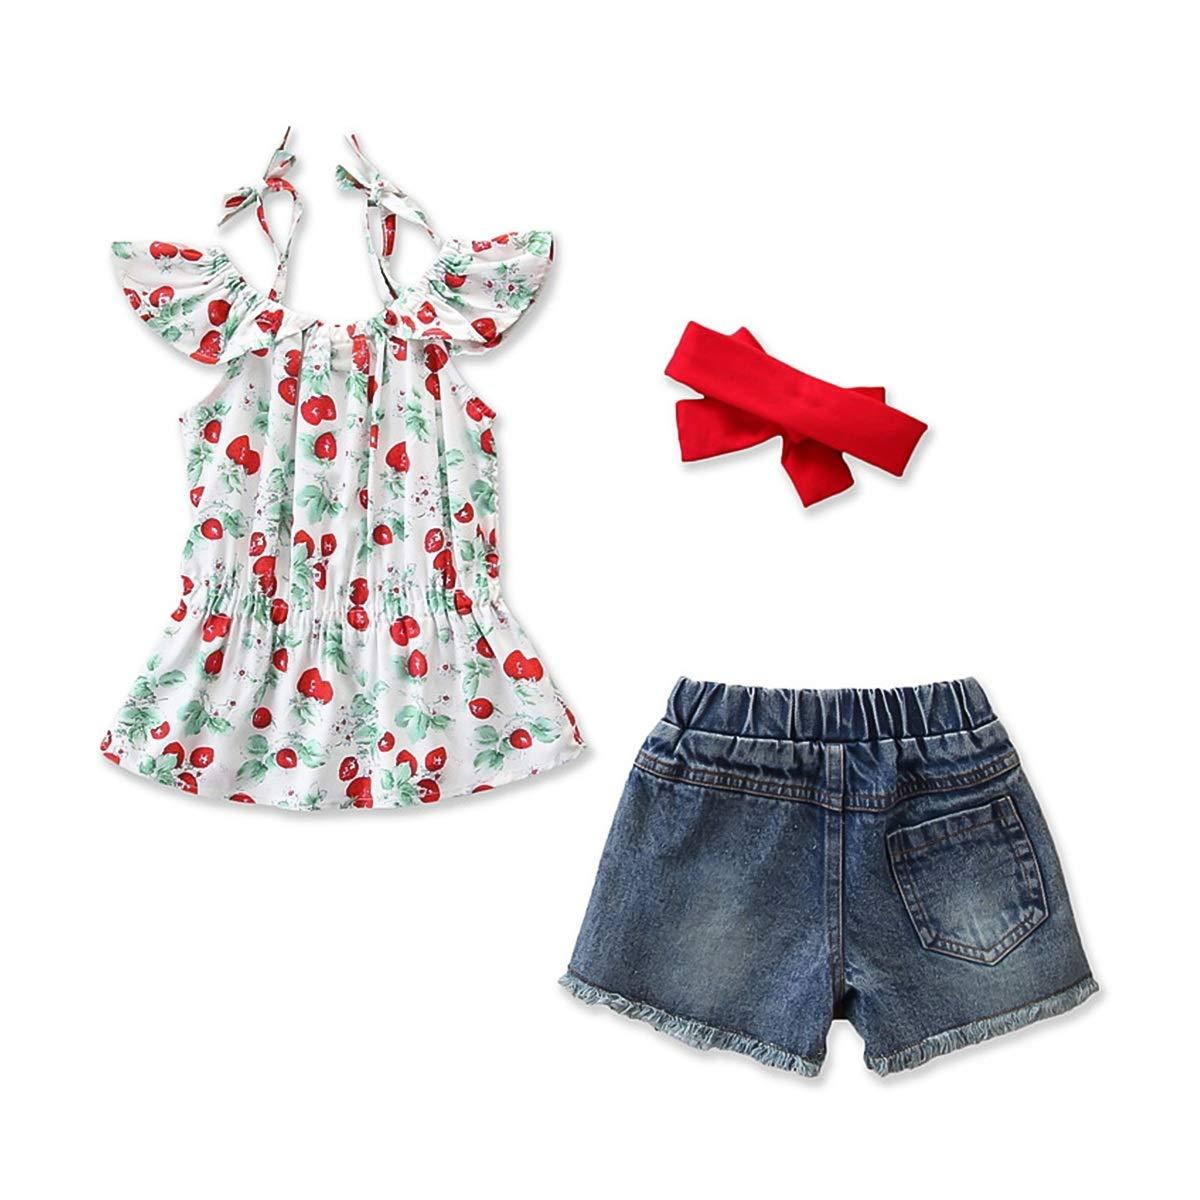 Girl Short Sleeve Clothes Cherry Tops Shirt Hole Pants Bowknot Headband Set